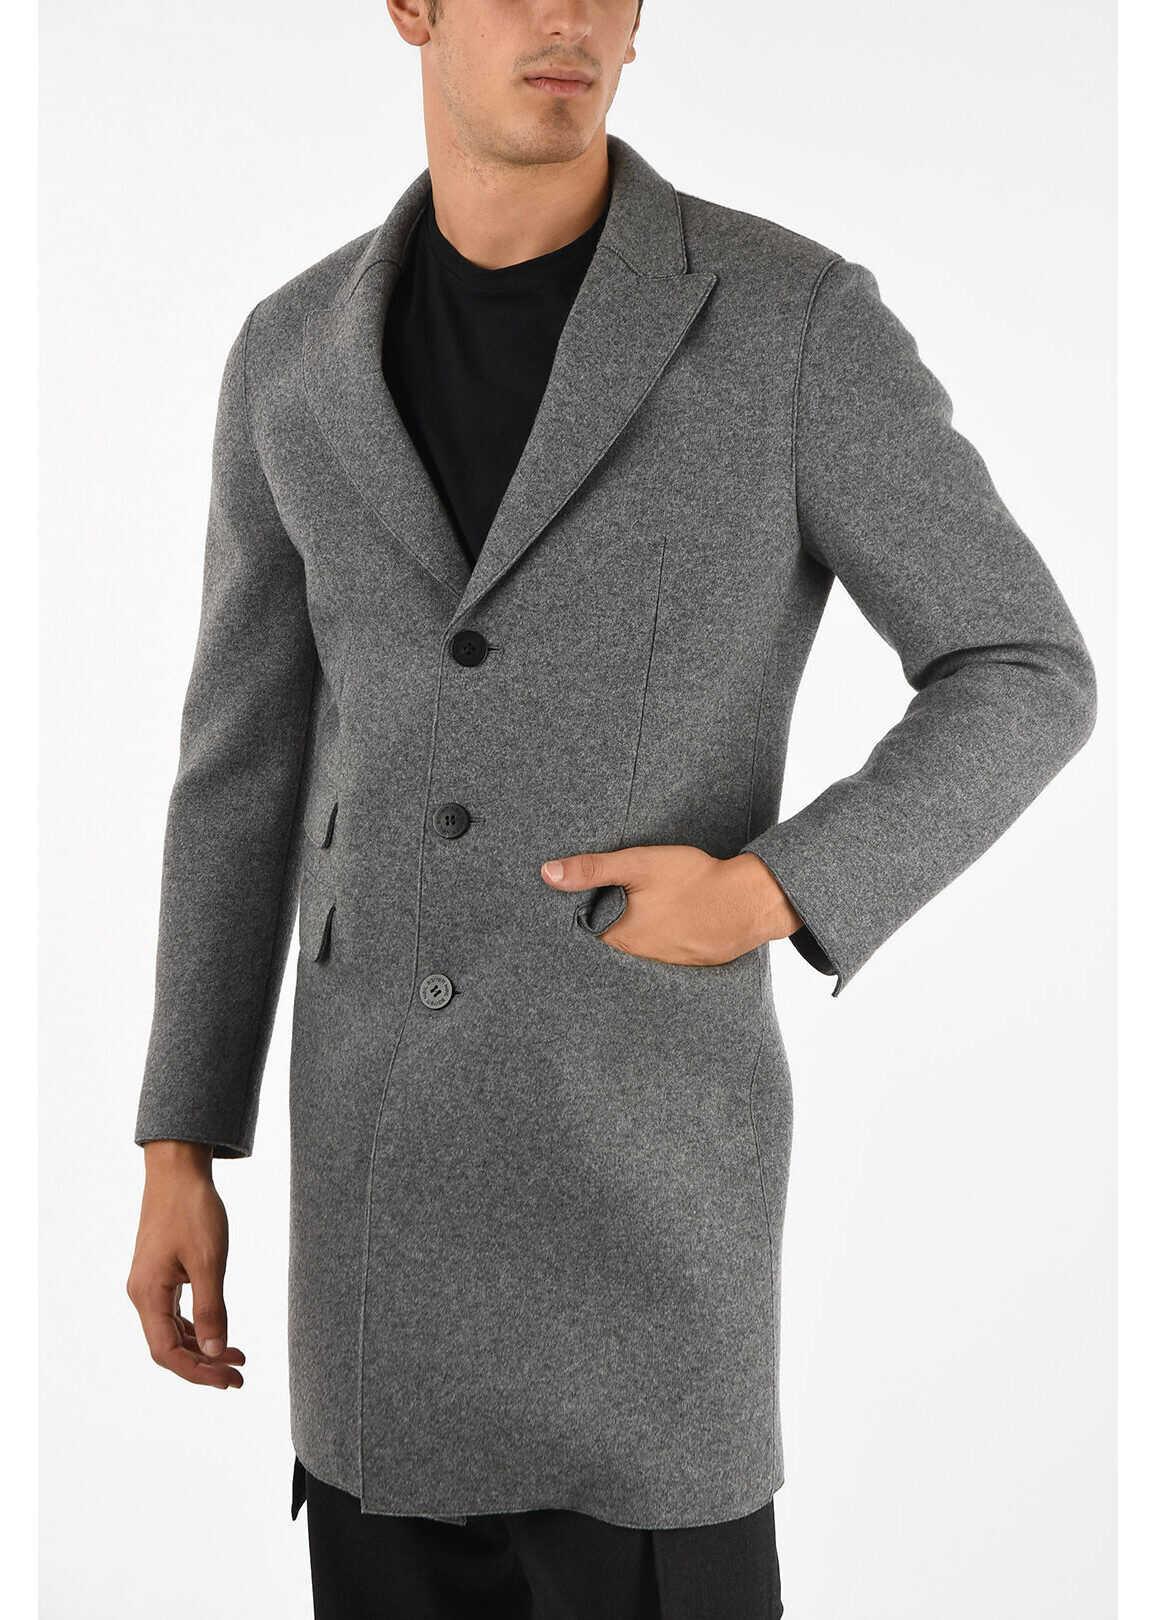 Neil Barrett Skinny Fit 3 Button Coat GRAY imagine